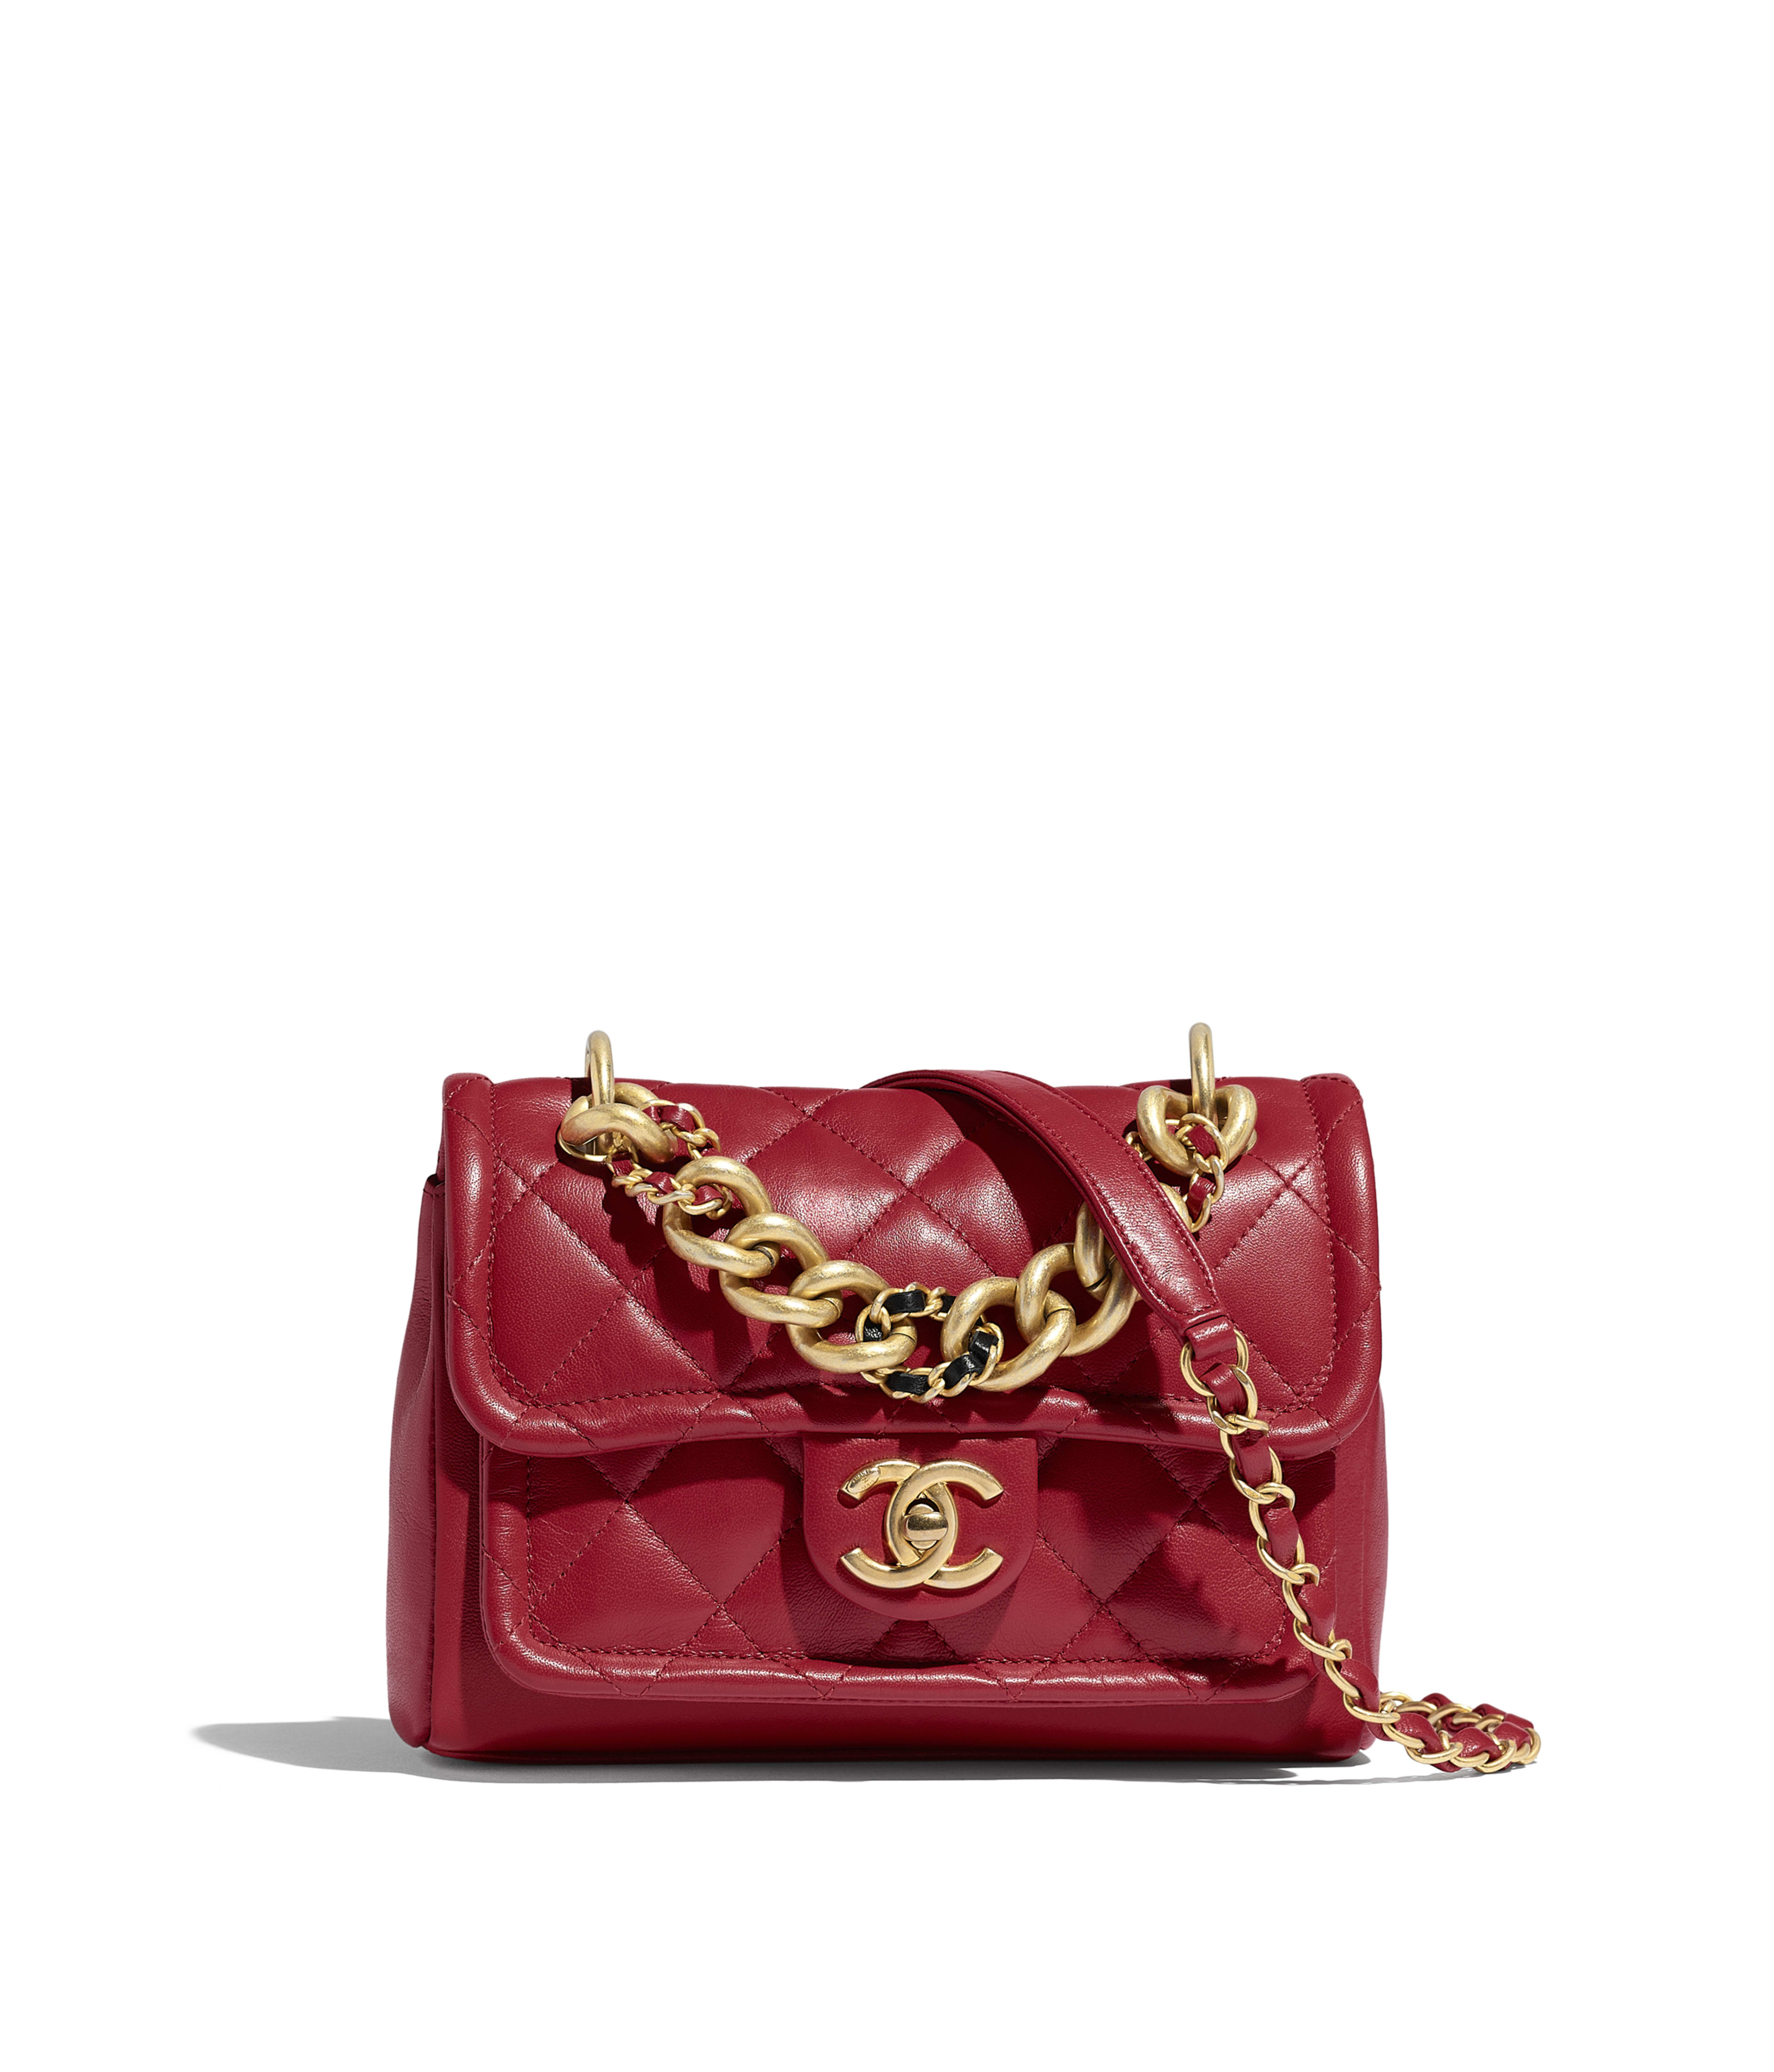 9a09ce67a8f Handbags - Fashion | CHANEL